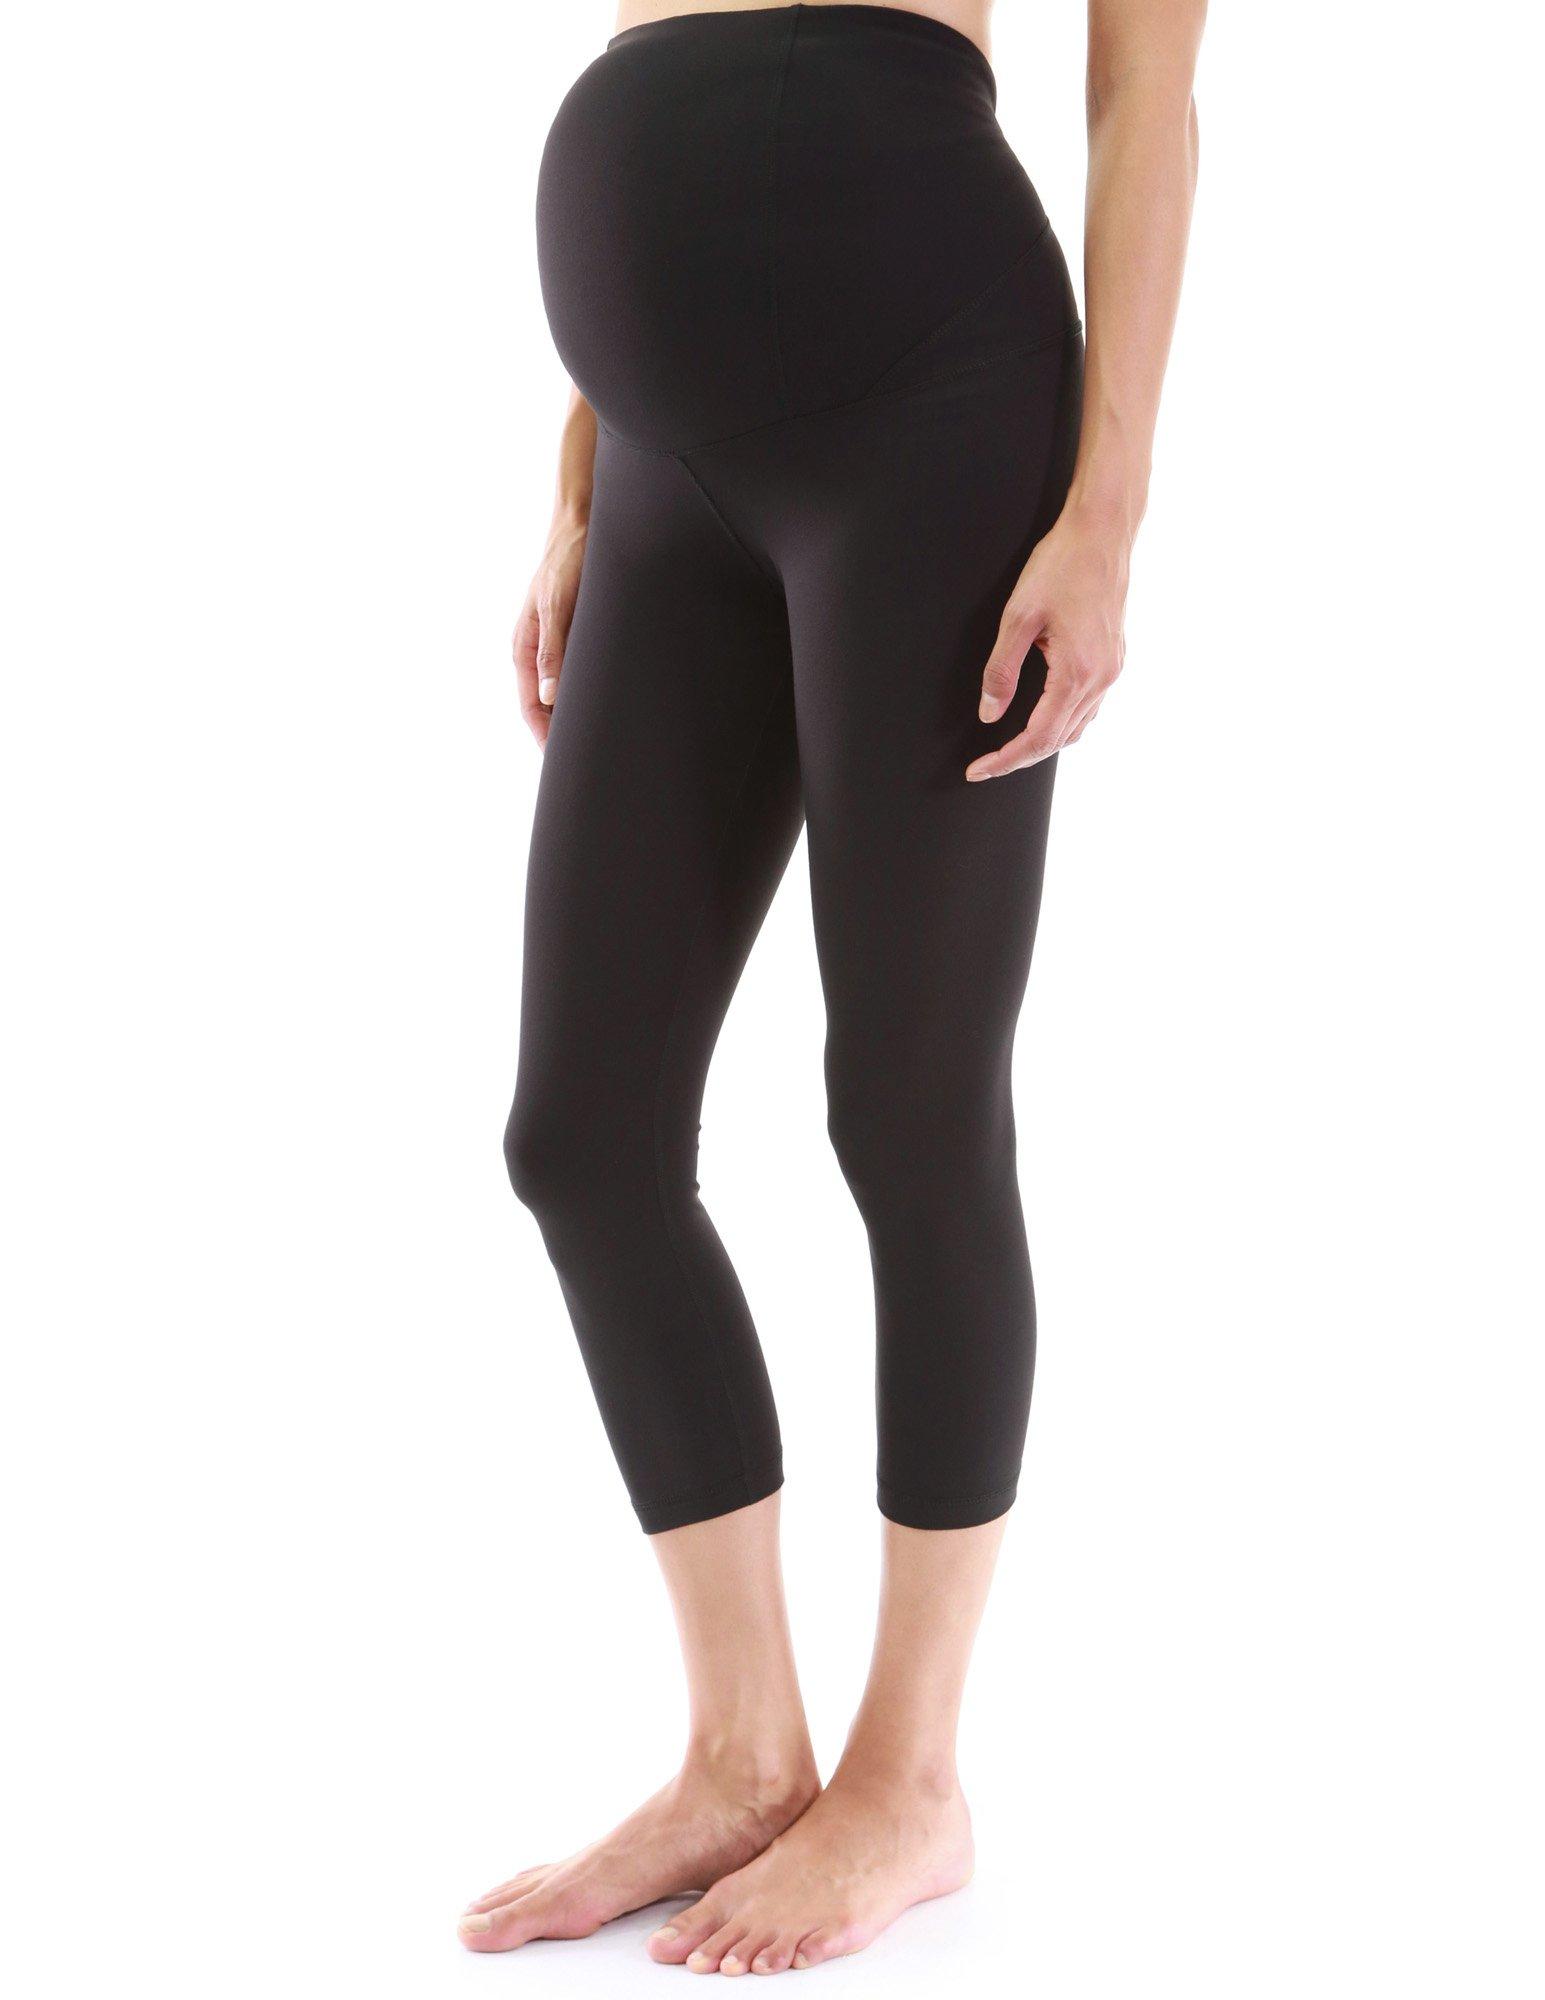 PattyBoutik Mama Shaping Series Maternity Crop Legging Yoga Pants (Black L)